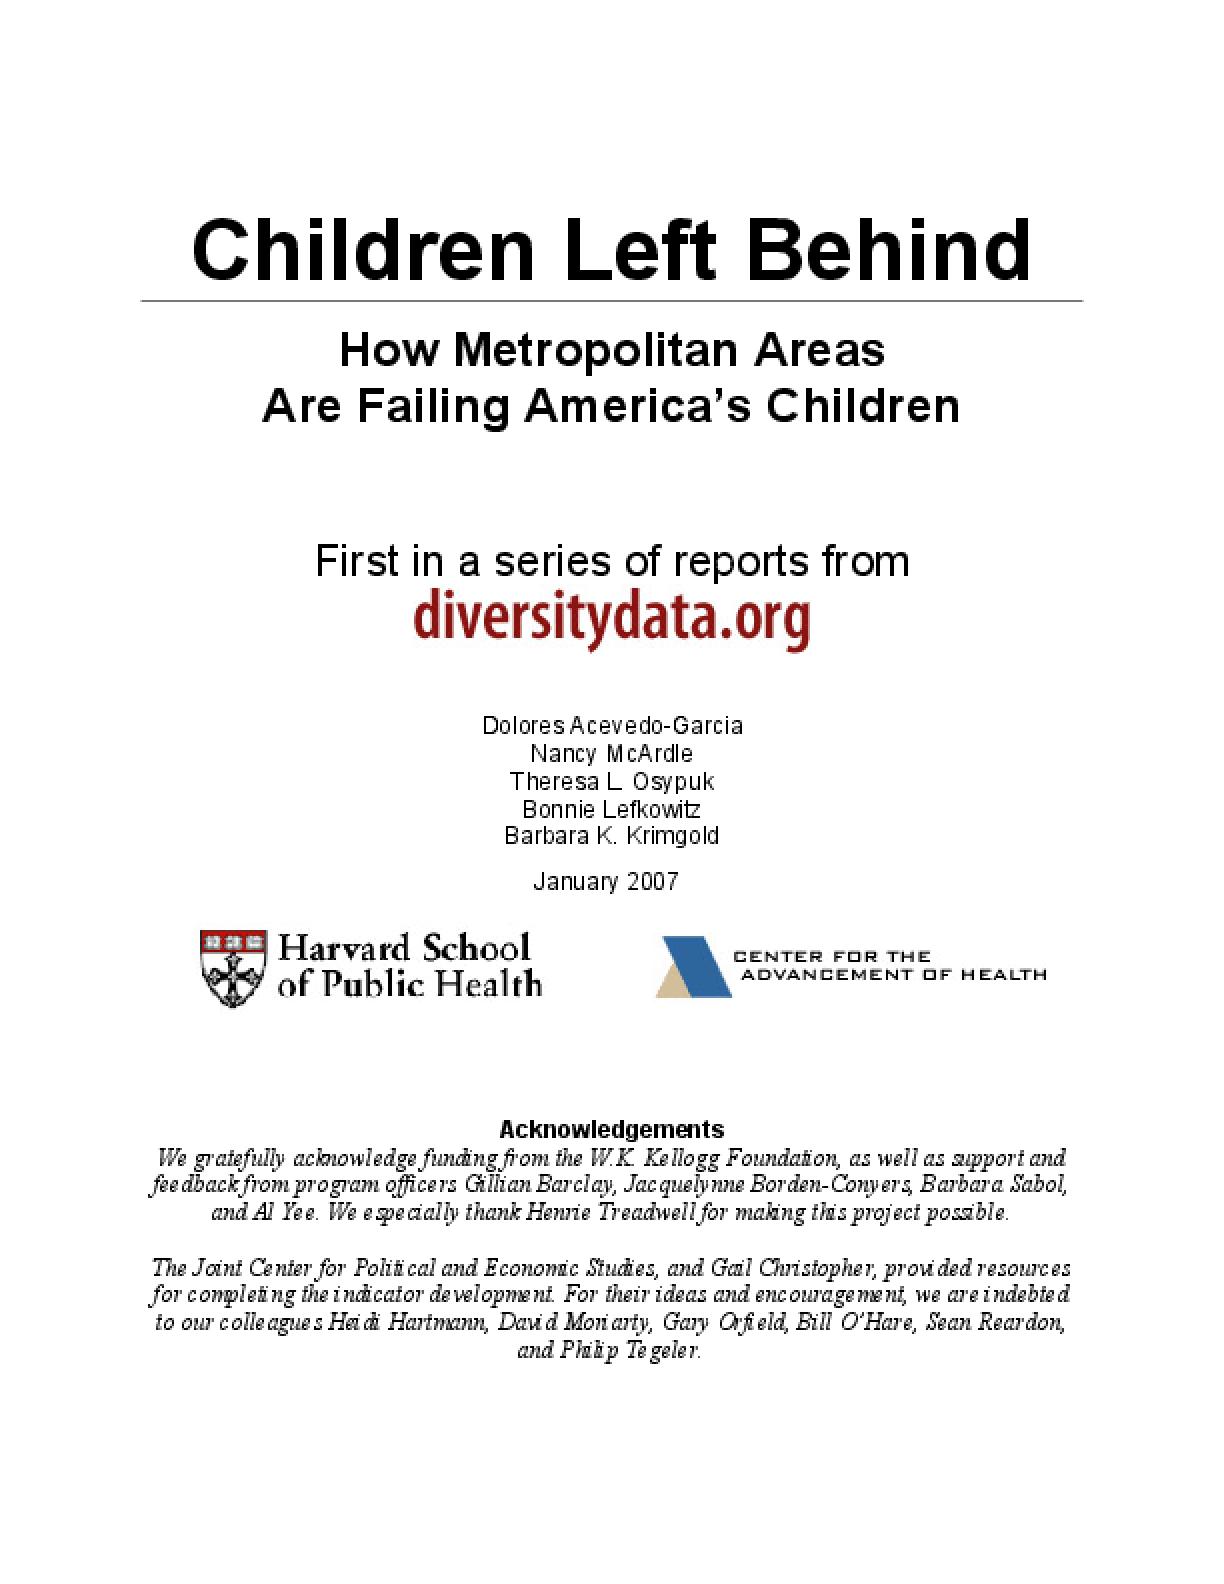 Children Left Behind: How Metropolitan Areas Are Failing America's Children